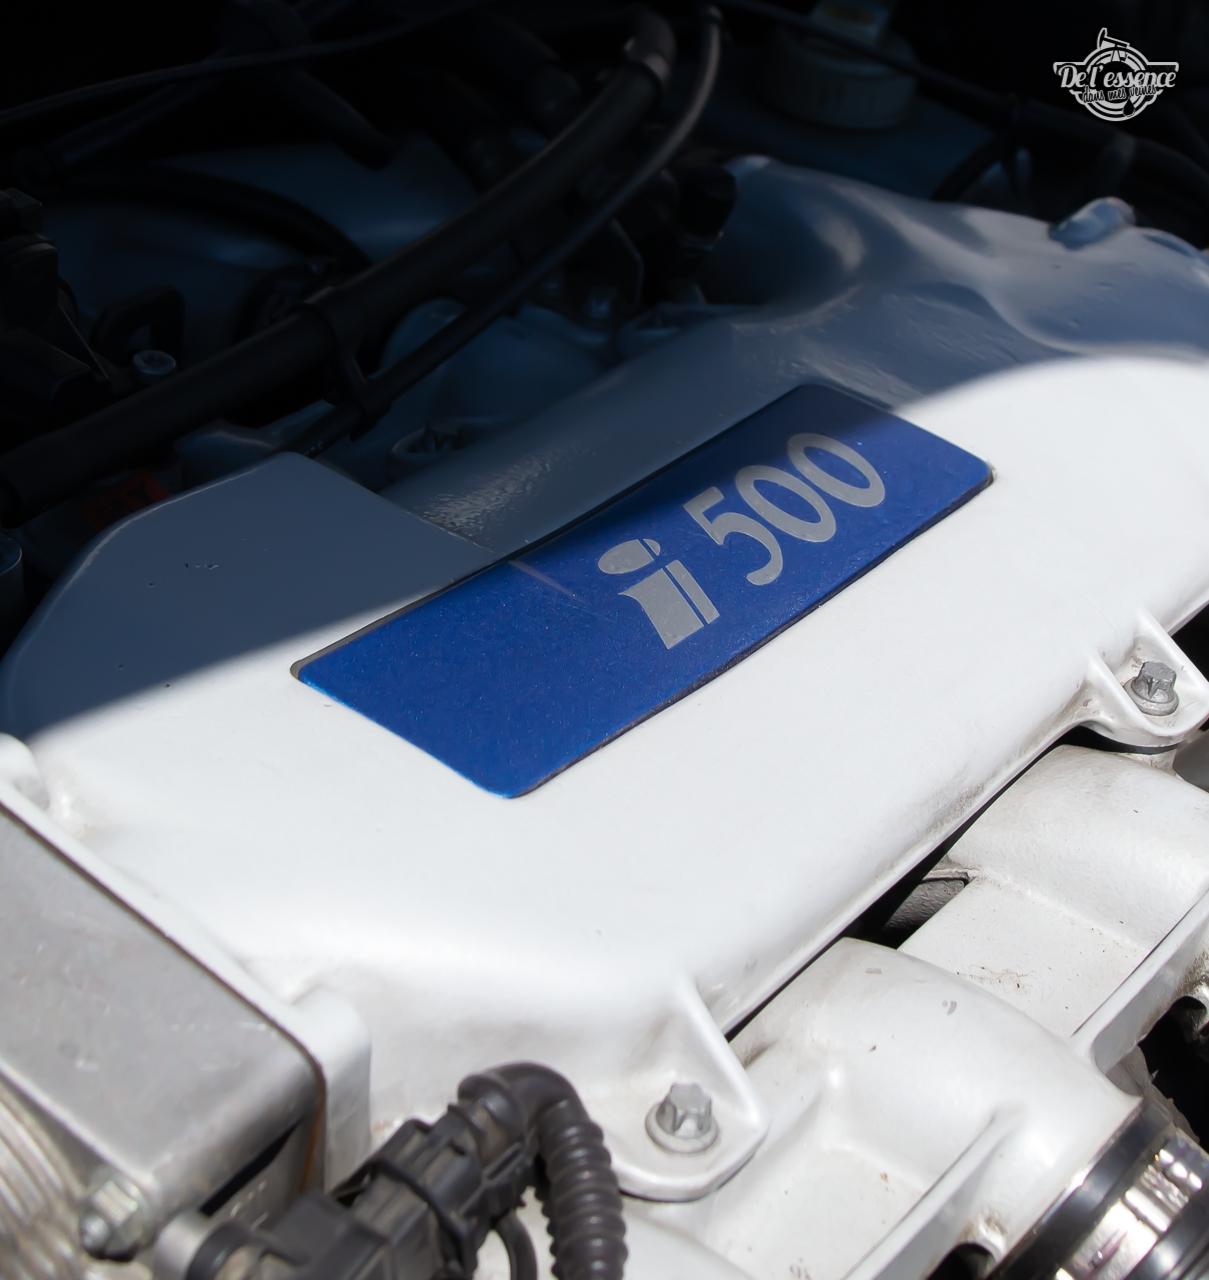 Opel Vectra V6 i500 replica... Papa pressé ! 4